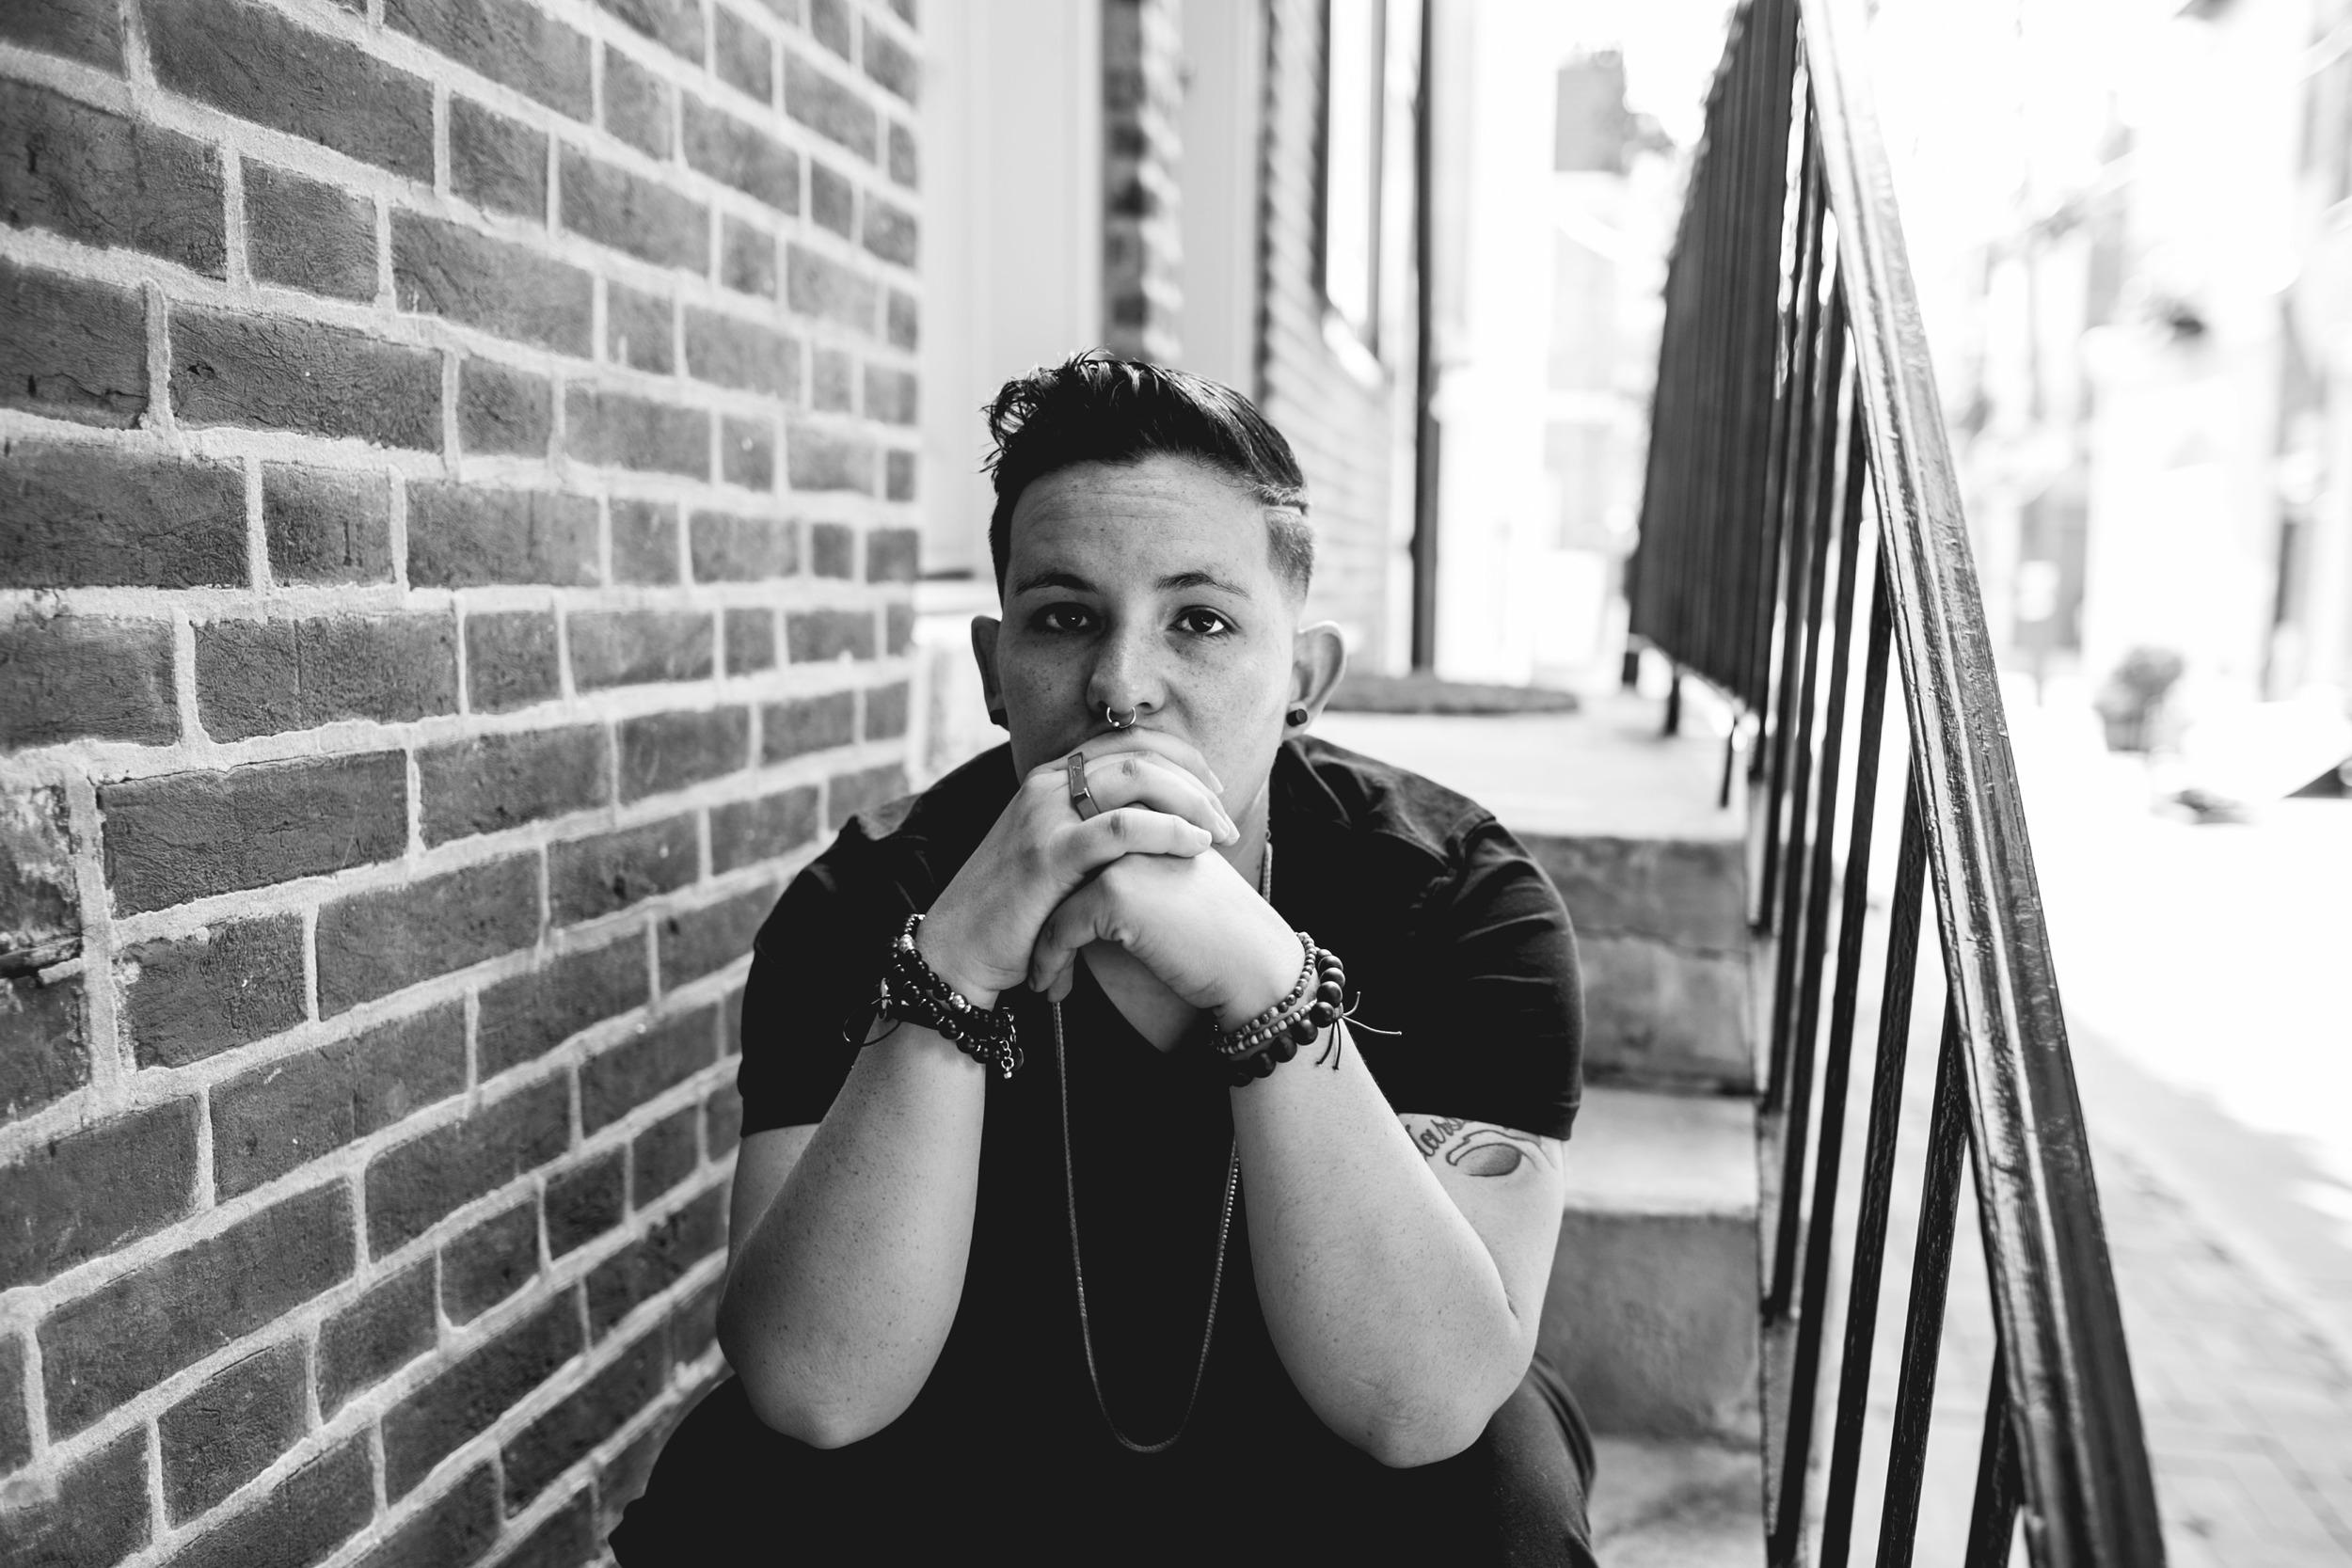 Philadelphia Weekly Forward Philly Headshots by LGBTQ photographer, Queer DJ Nikki Lopez